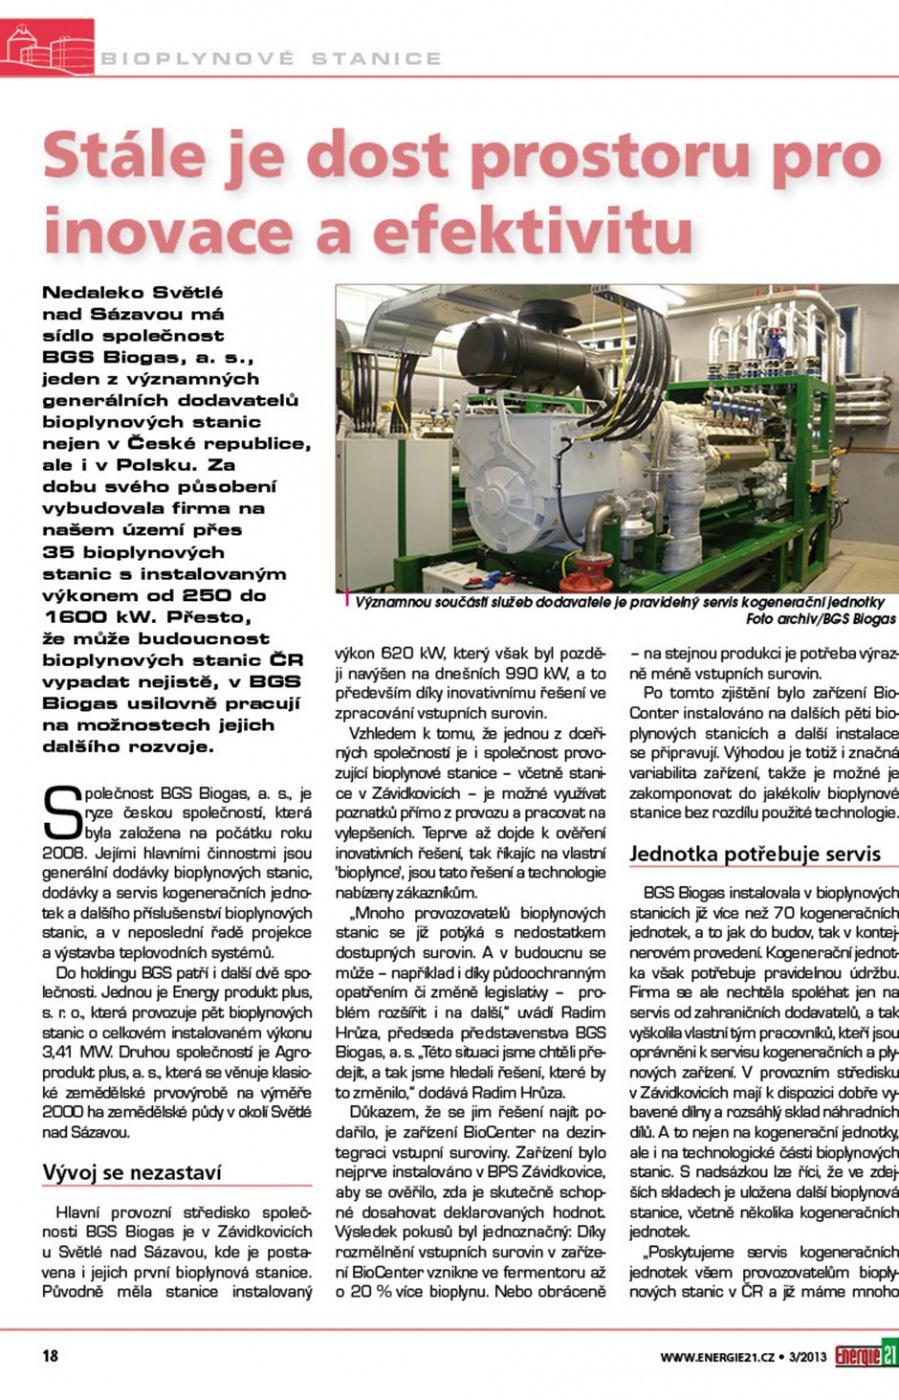 BGS-Biogas-Stale-je-dost-prostoru-pro-inovace-a-efektivitu